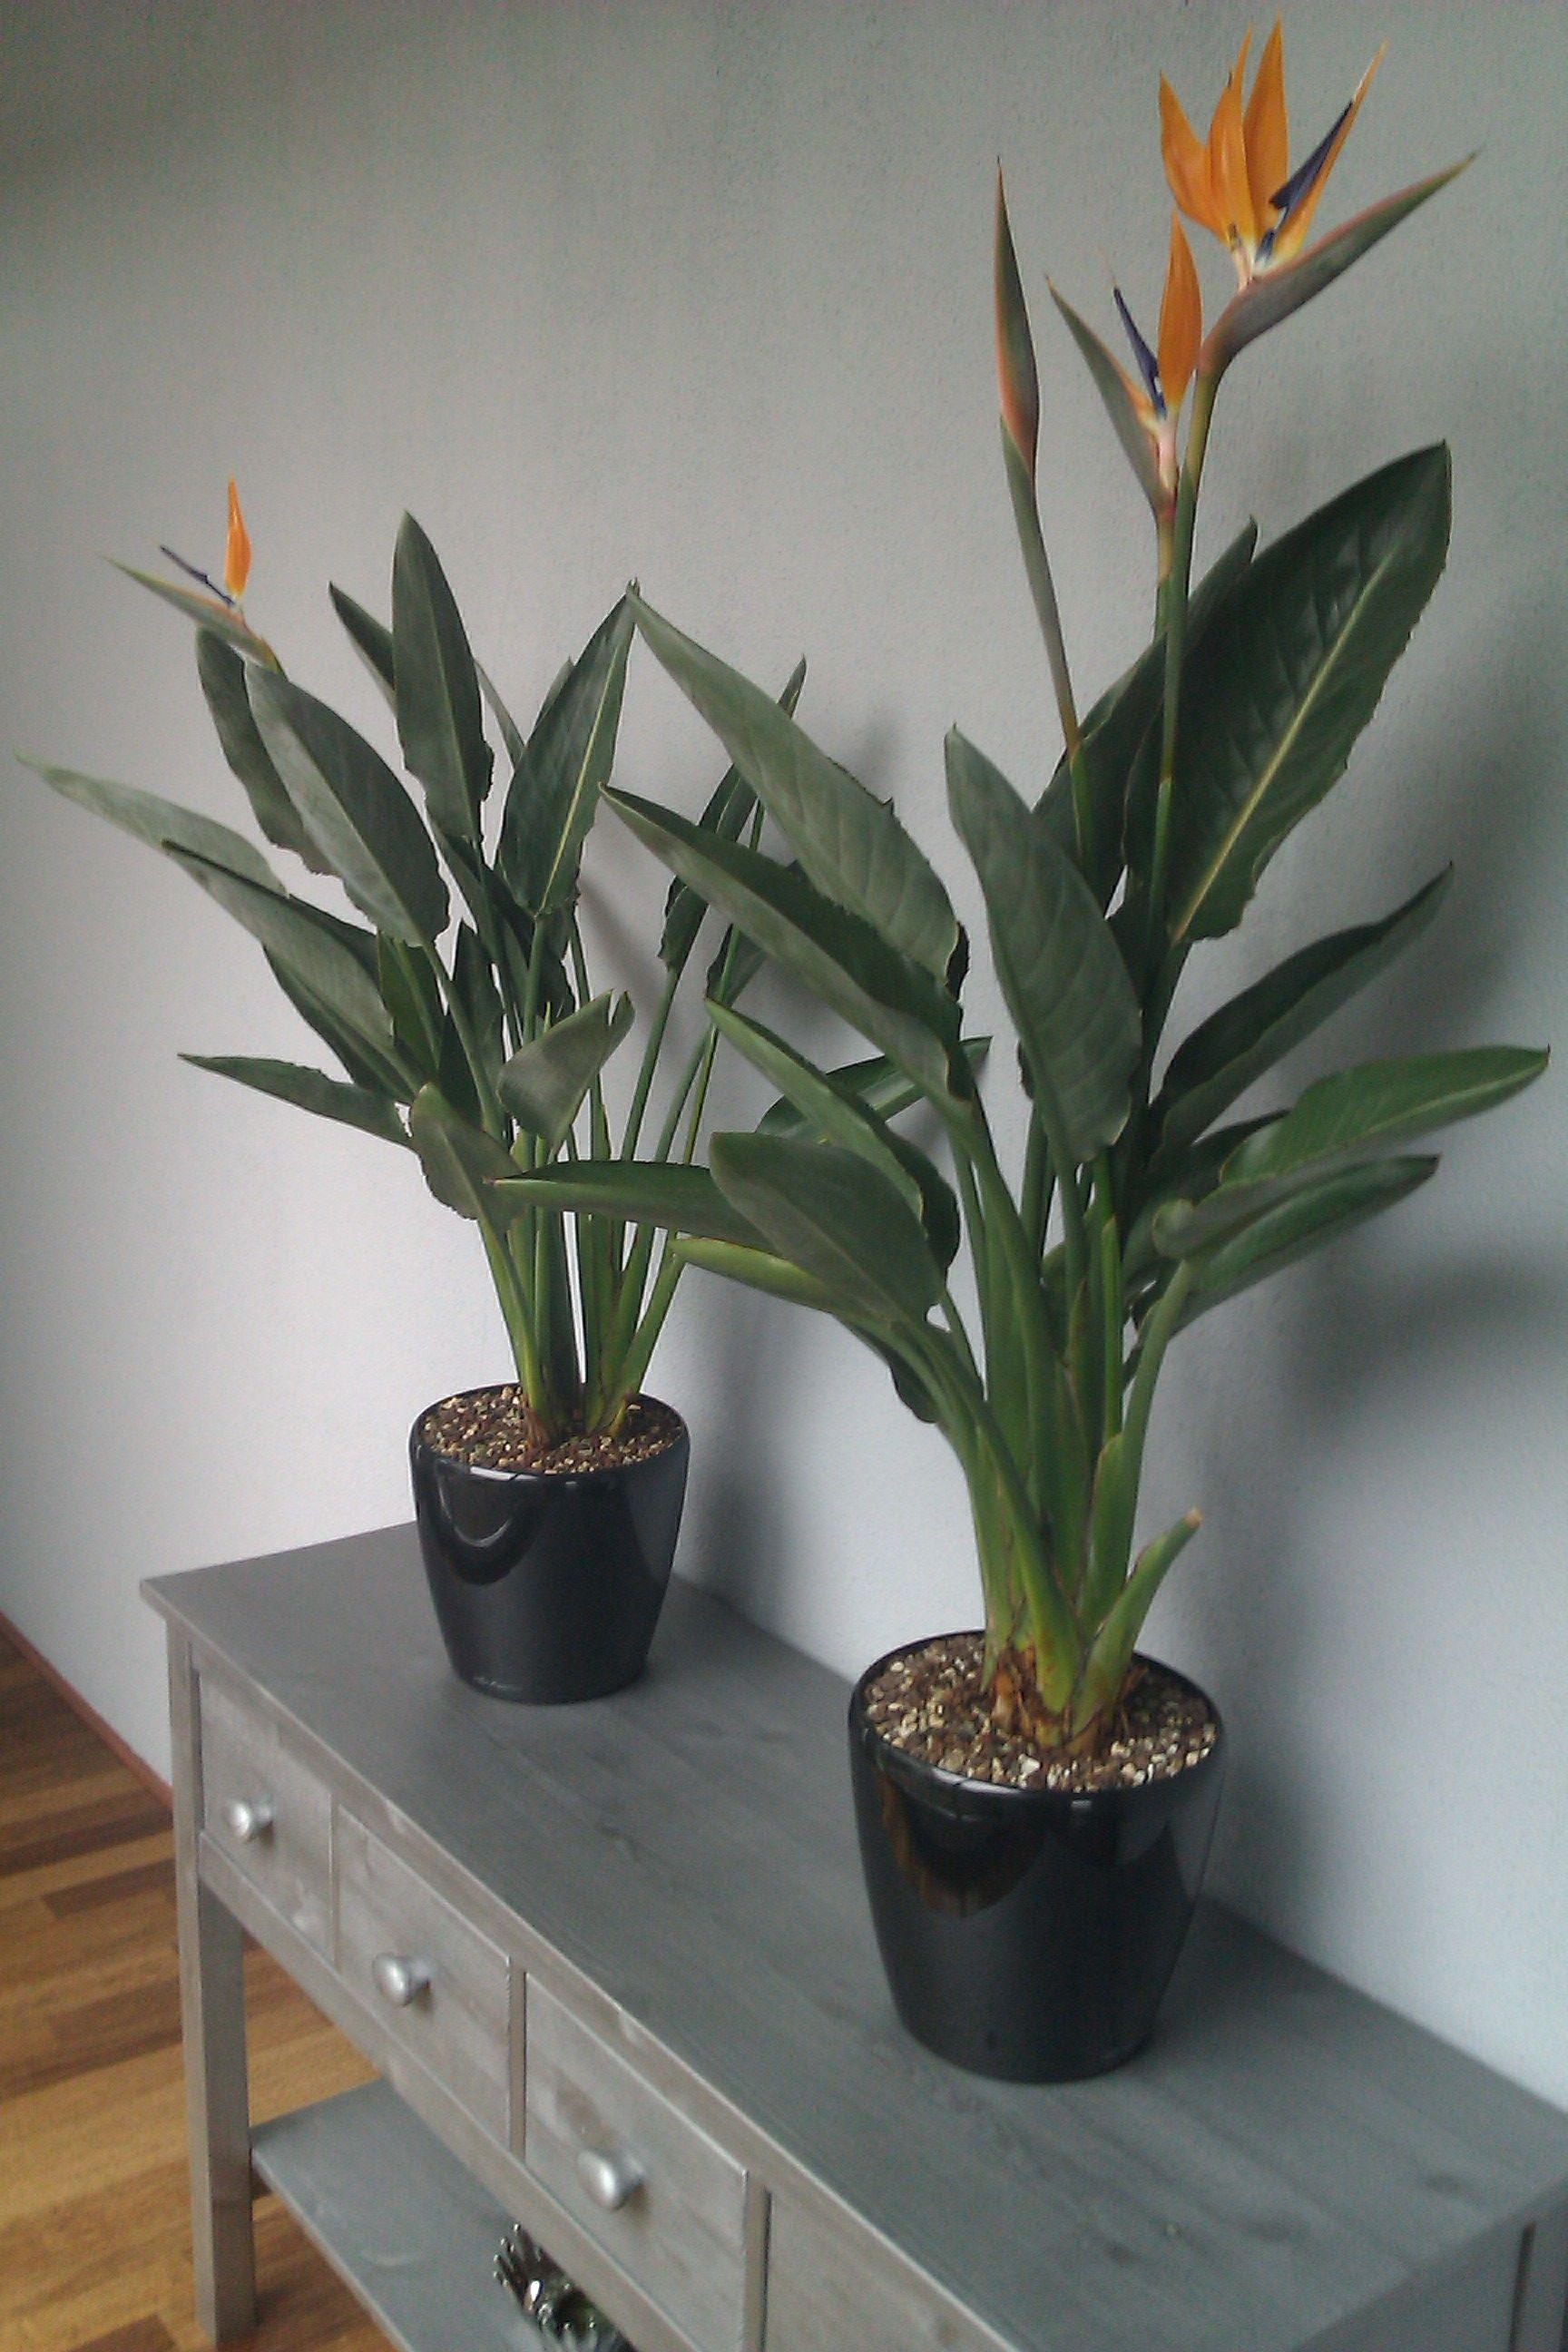 Best Kitchen Gallery: Strelitzia Plants Grown In 21cm Pot Small Size Flowering of Tropical Flowering Houseplants on rachelxblog.com